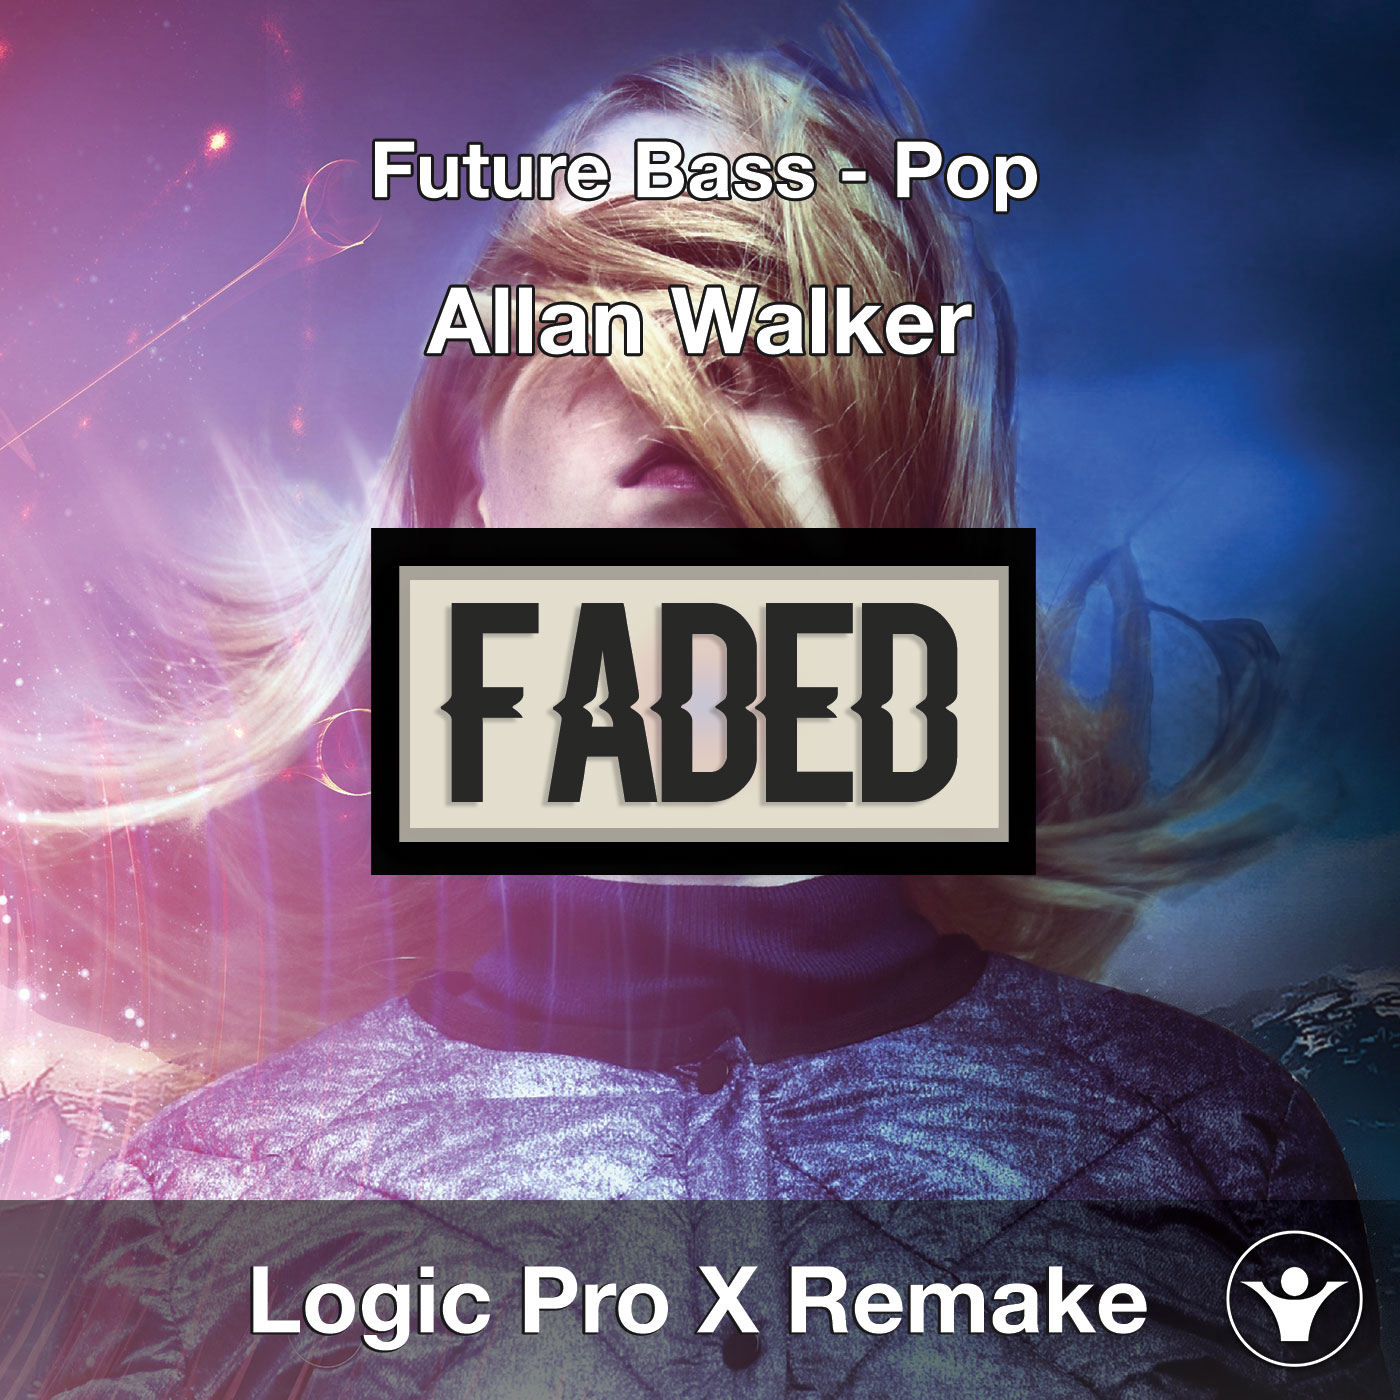 Faded (Alan Walker) - Logic Pro X Project Cover